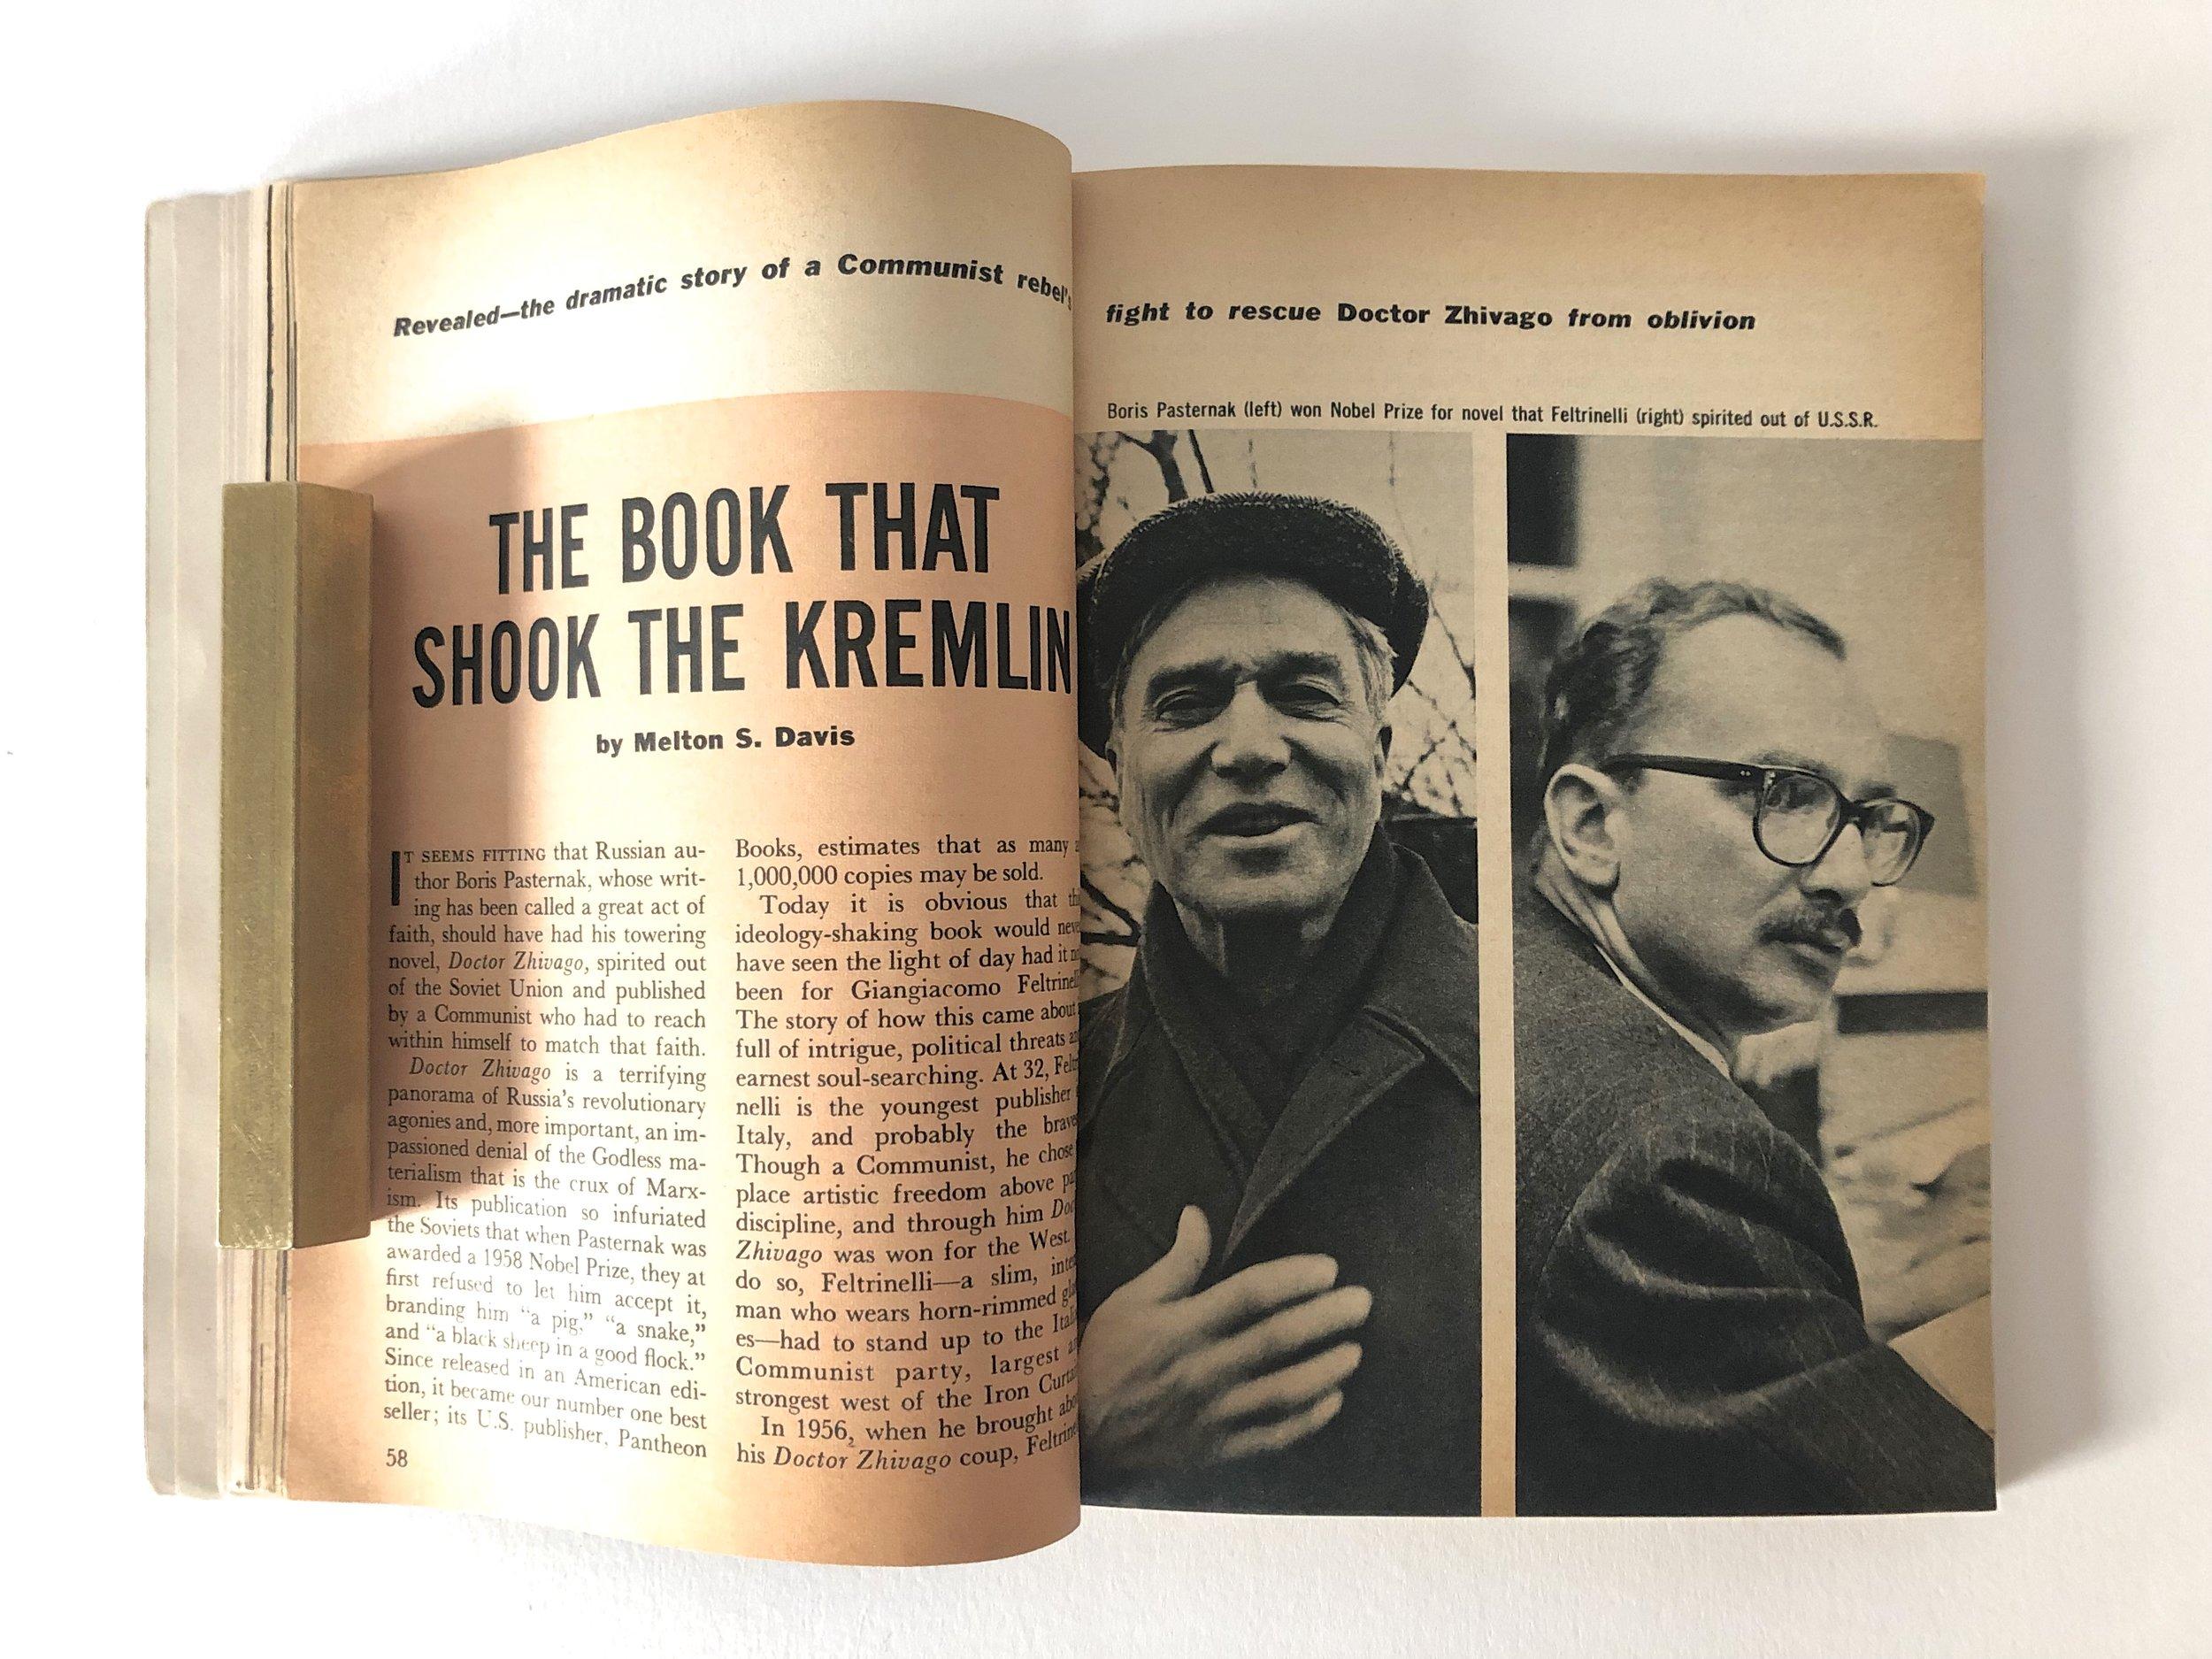 1959 Coronet magazine